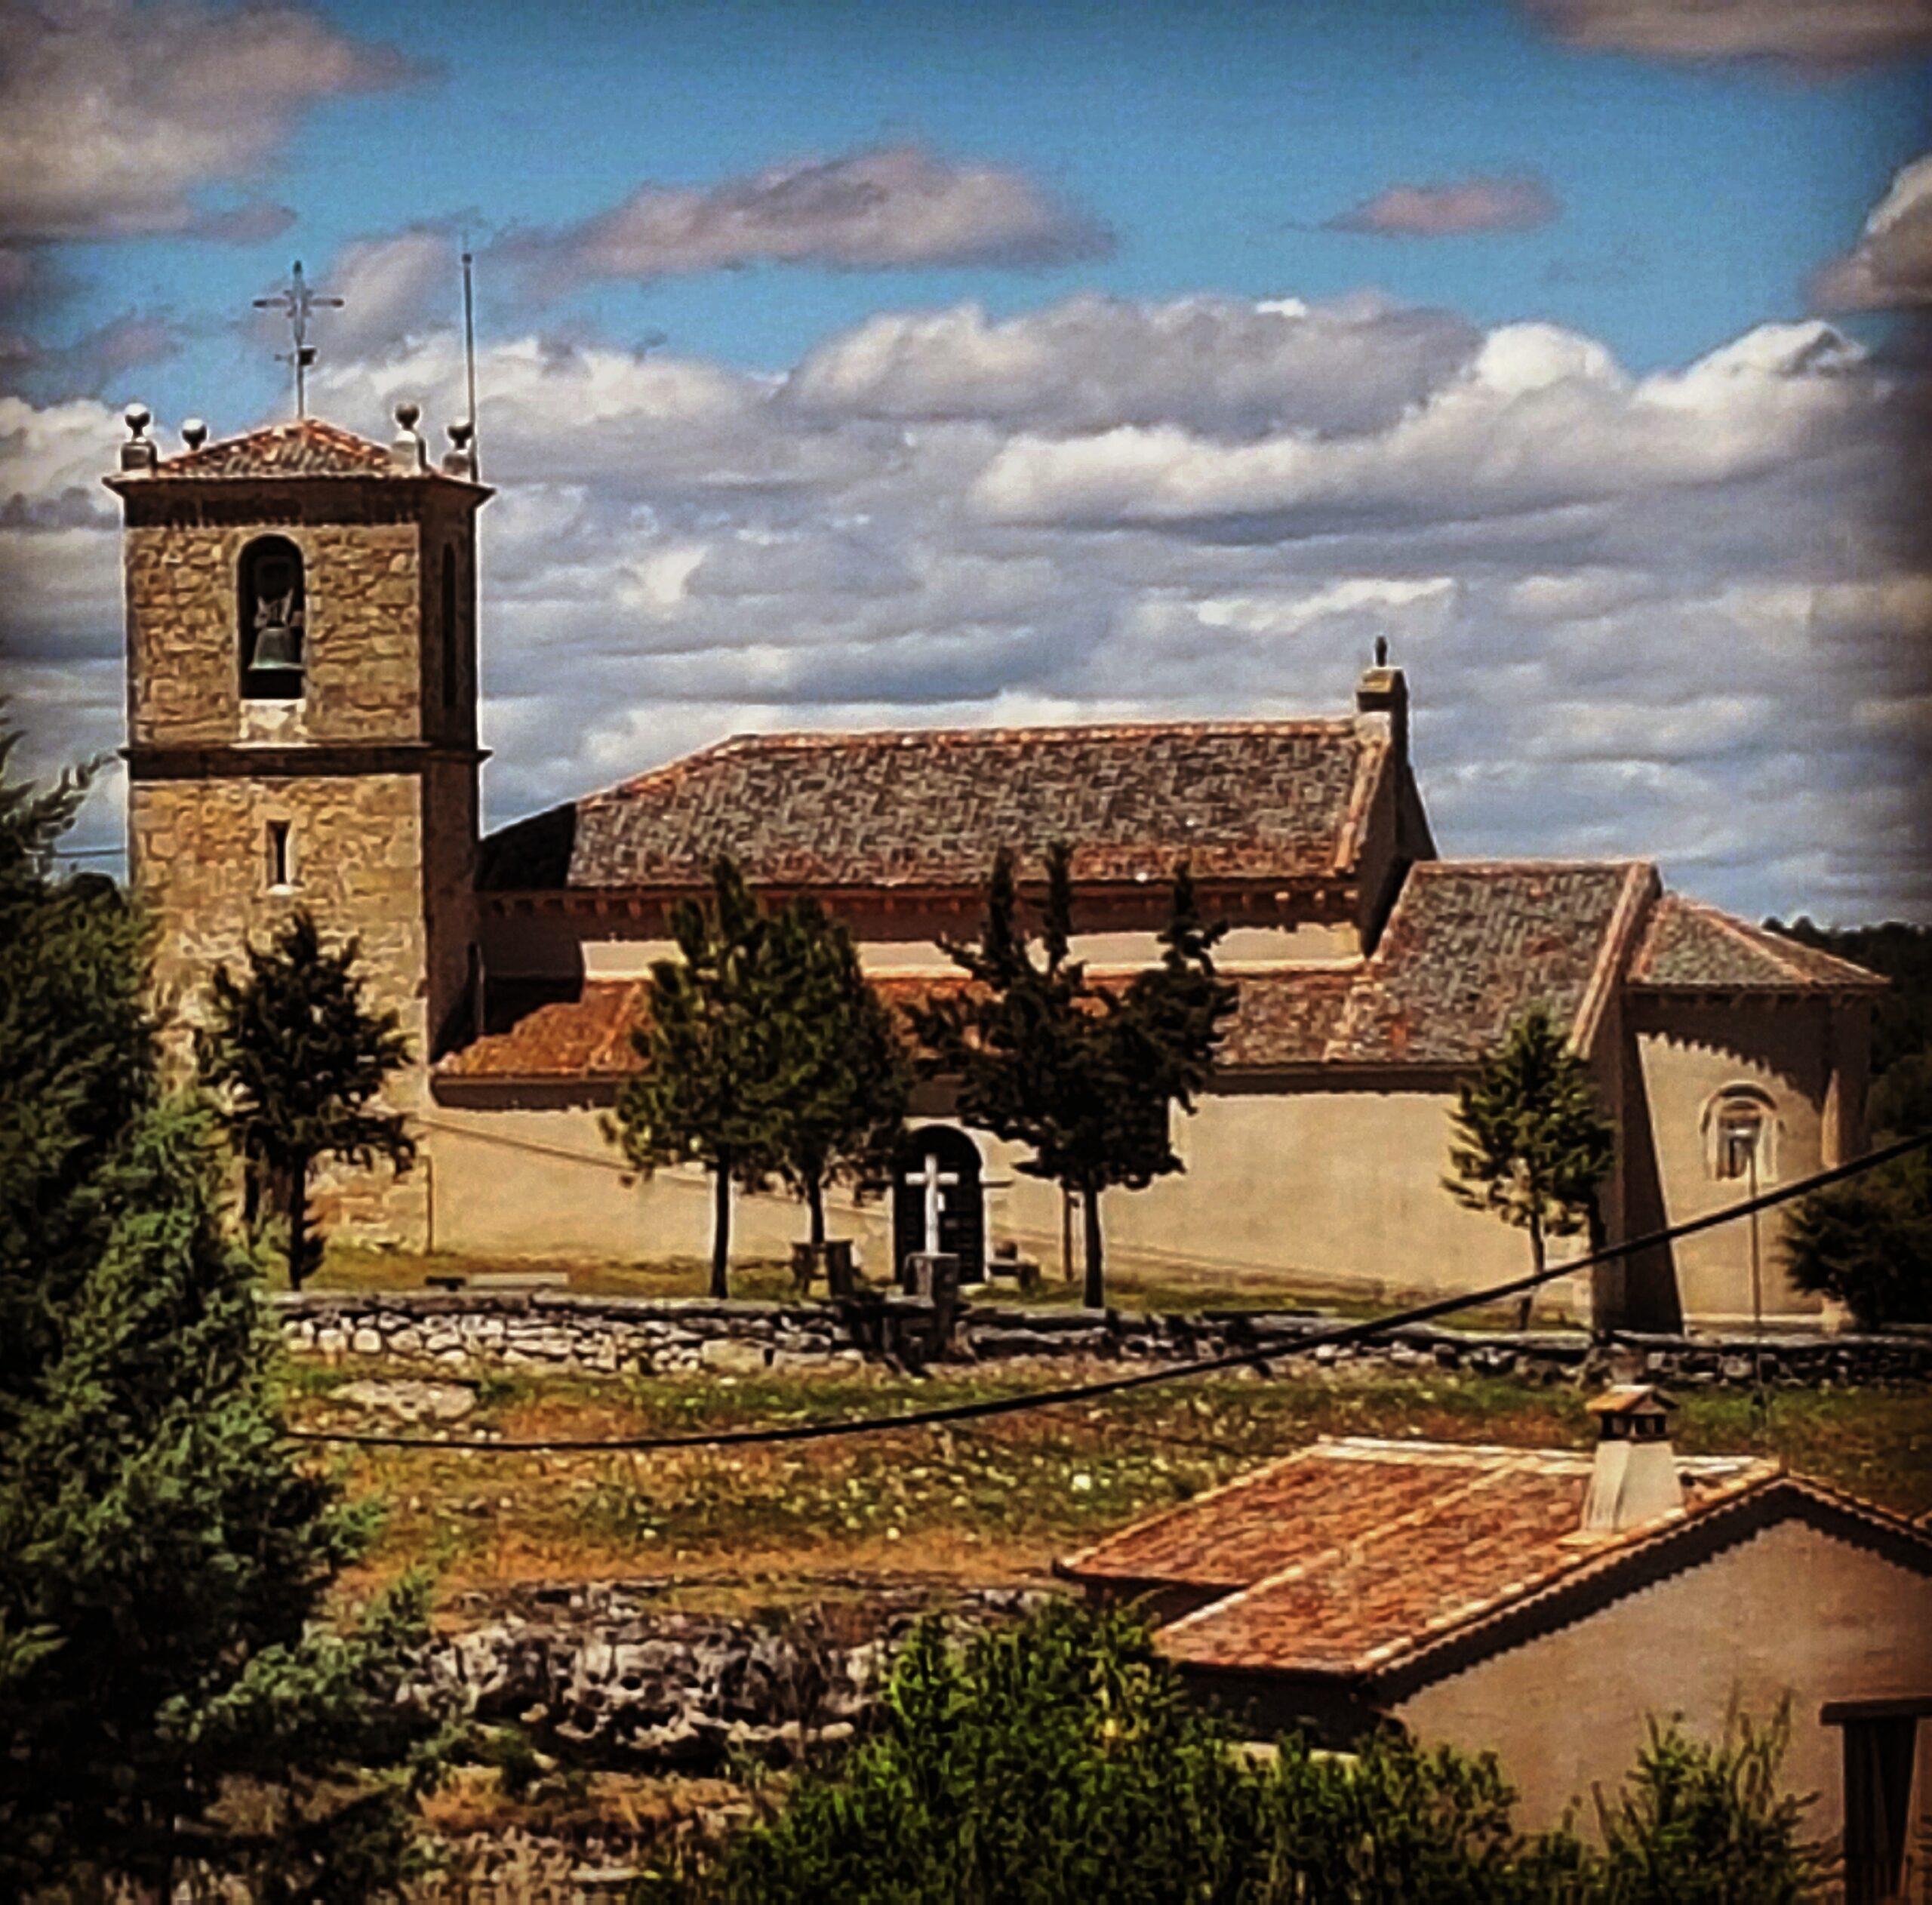 El Cubillo Segovia